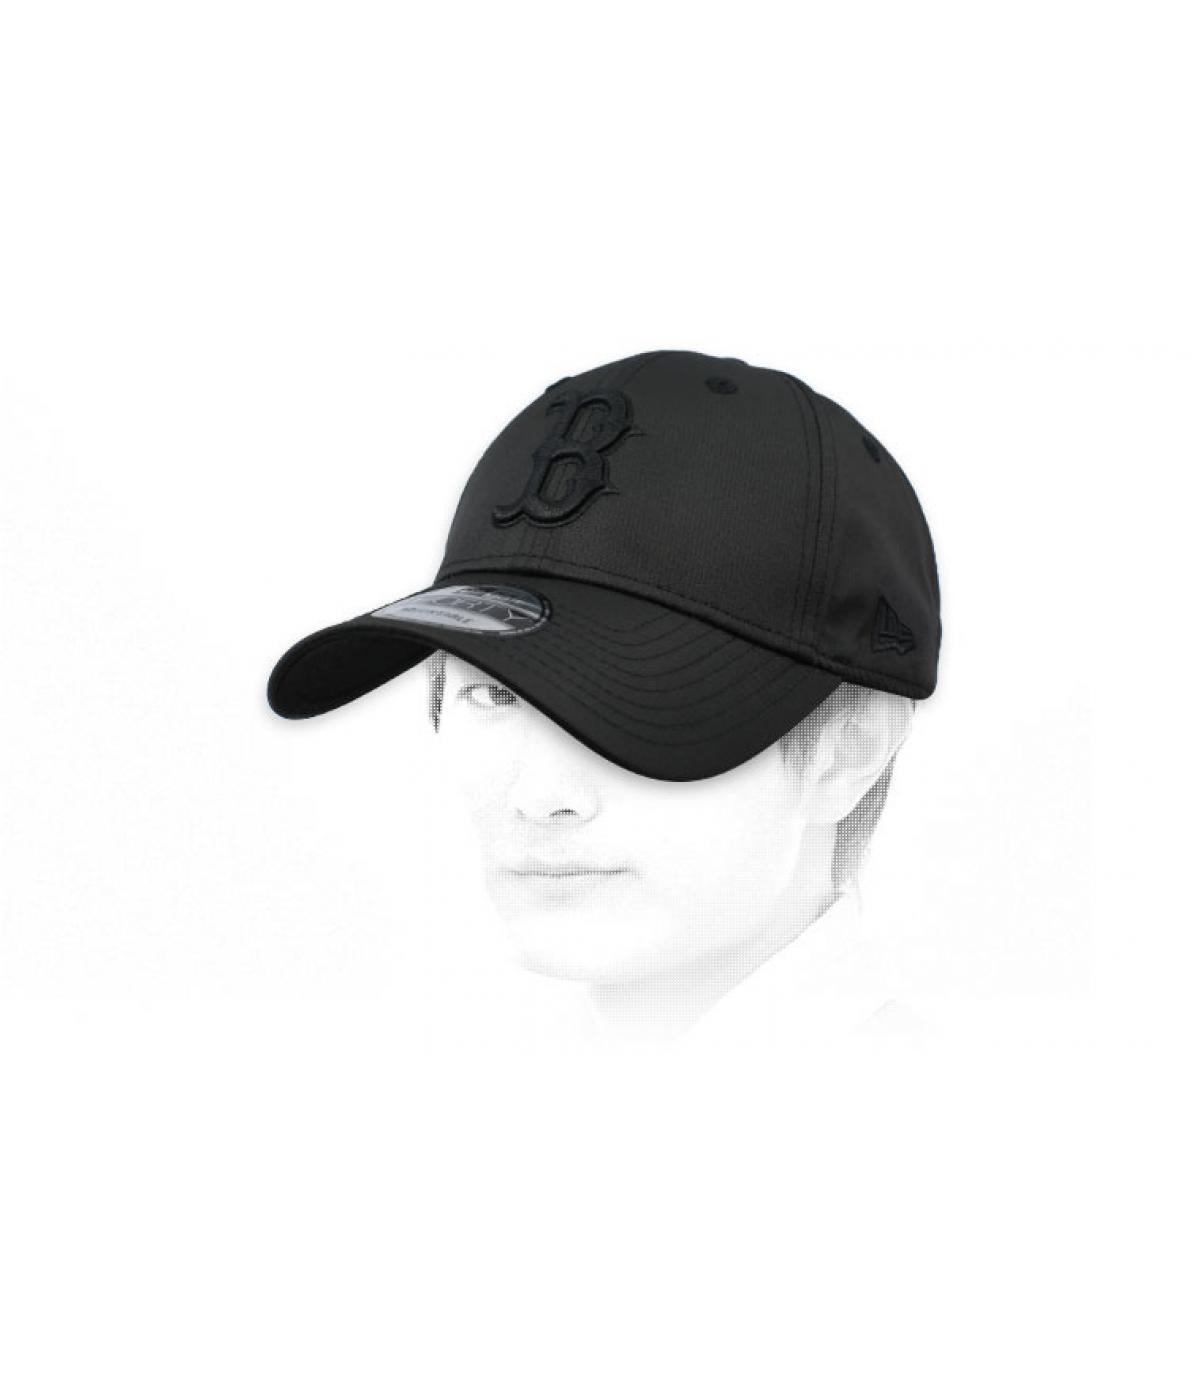 gorra B negro ripstop